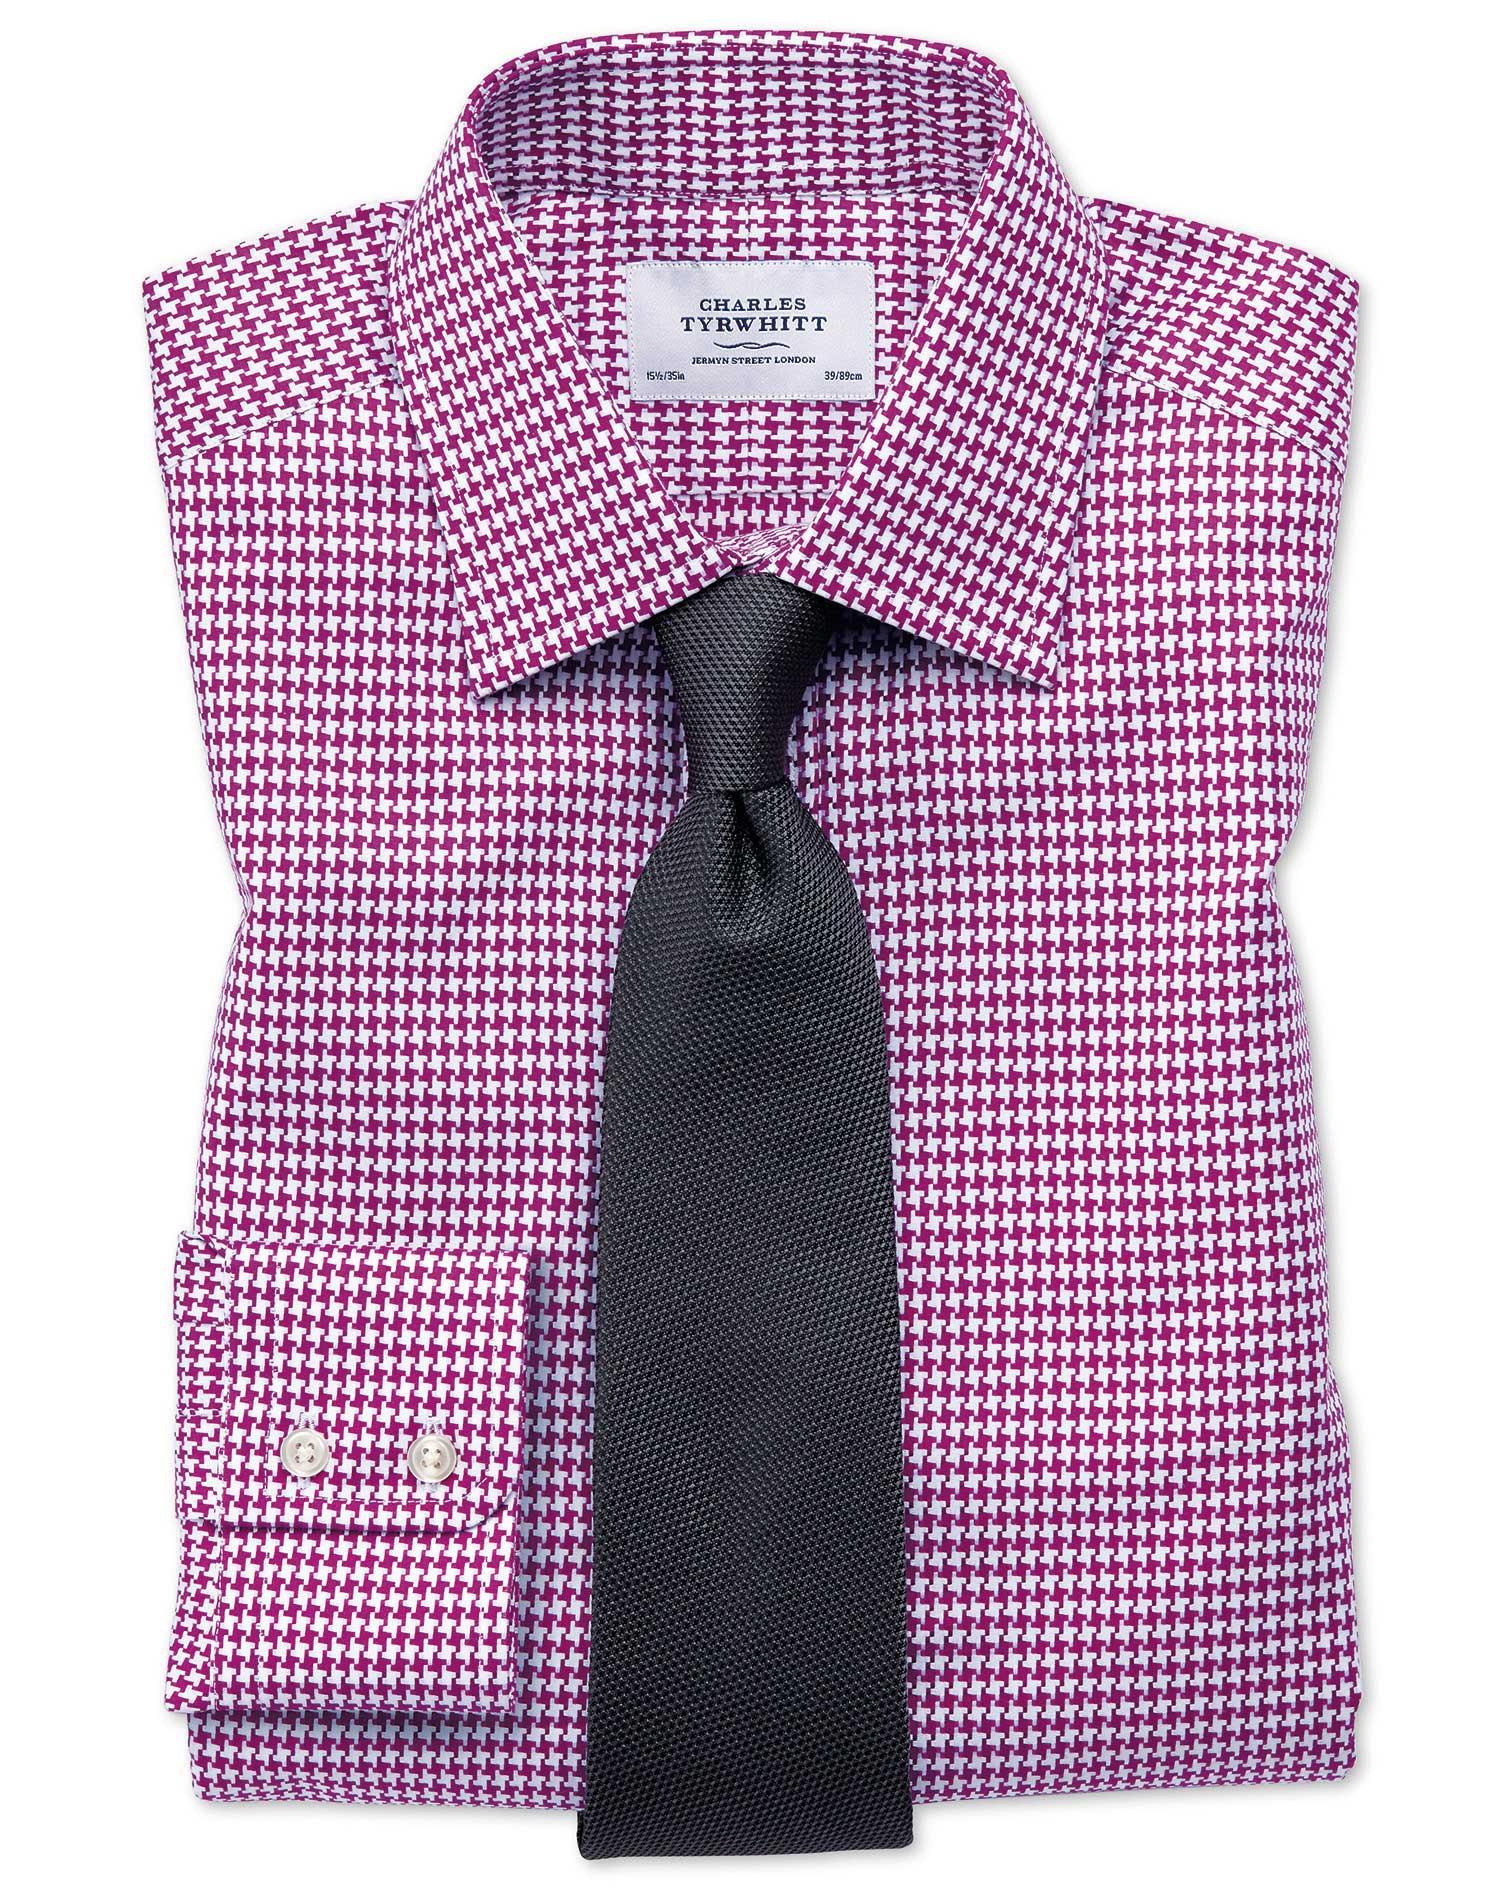 Classic Fit Large Puppytooth Berry Shirt Charles Tyrwhitt